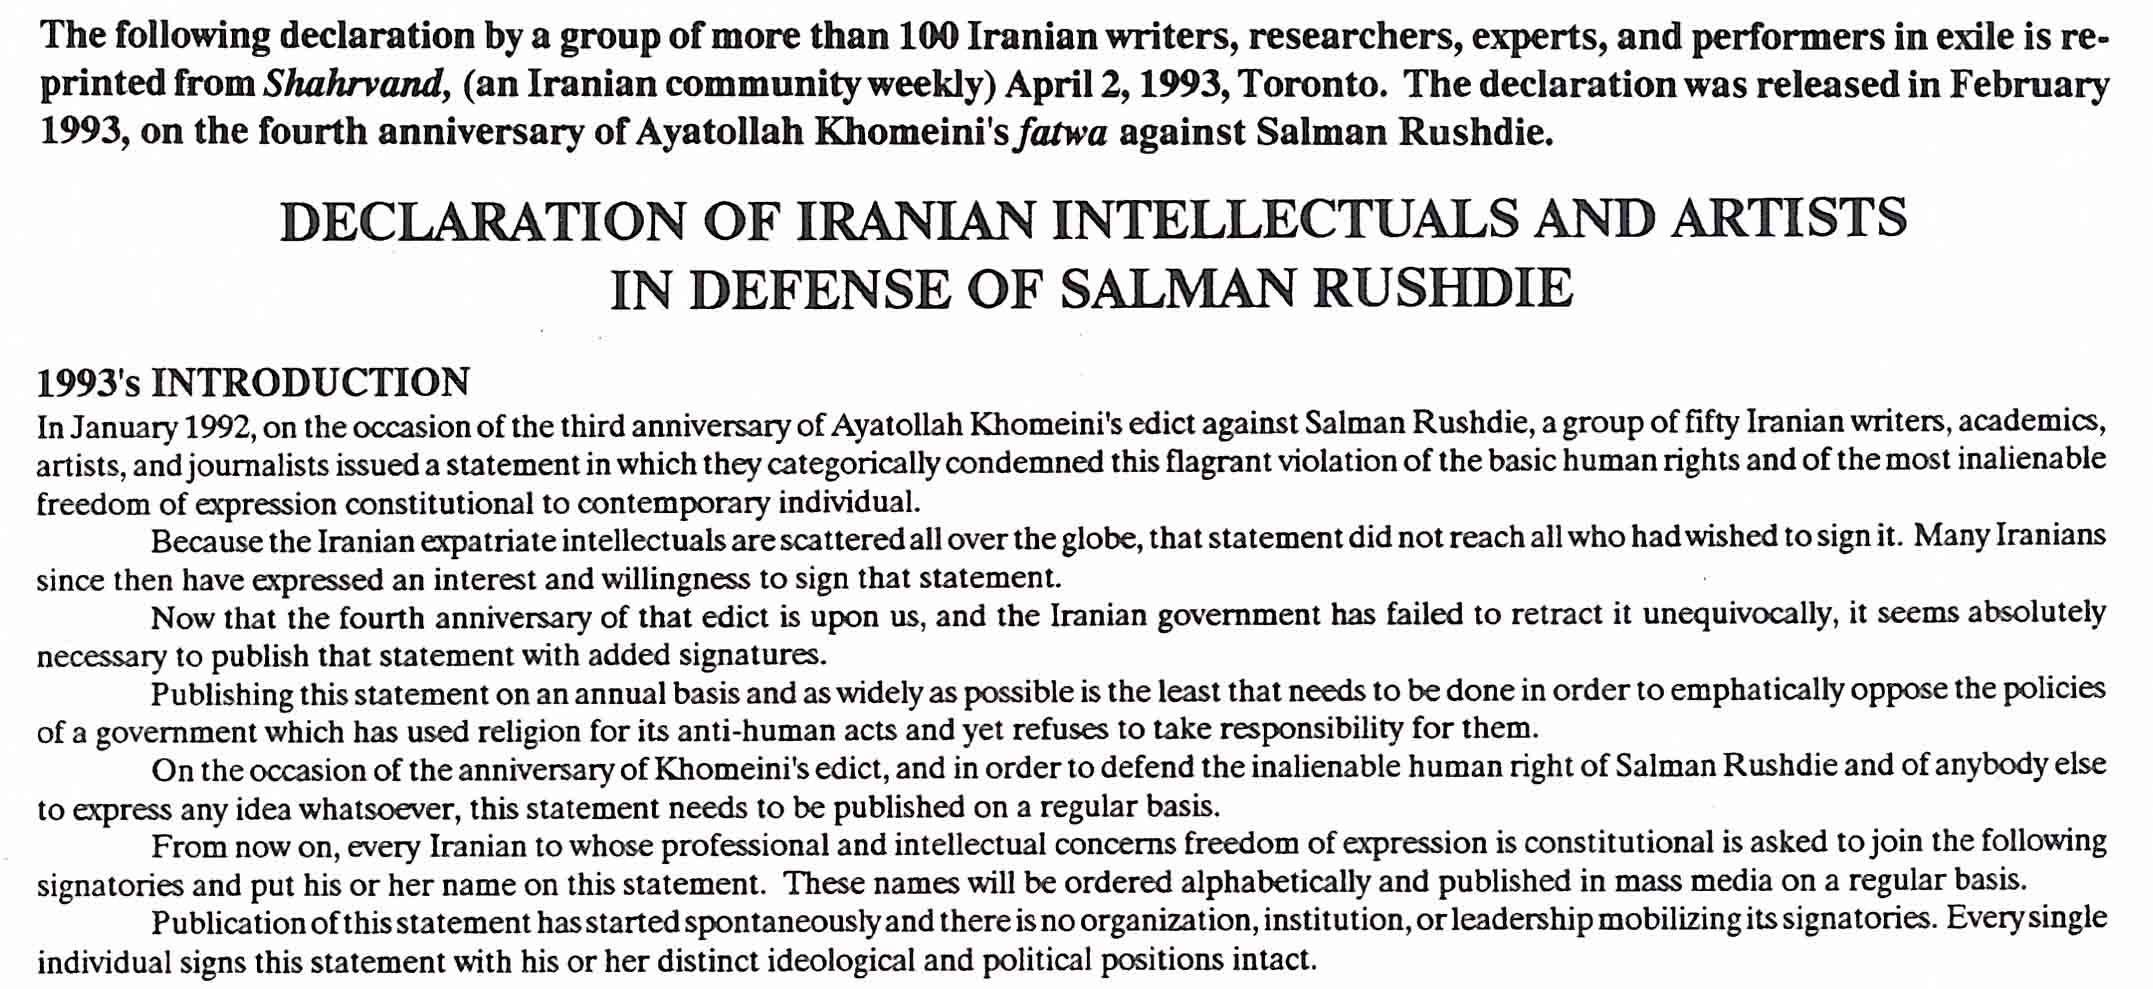 Iranian declaration in support of Salman Rushdie